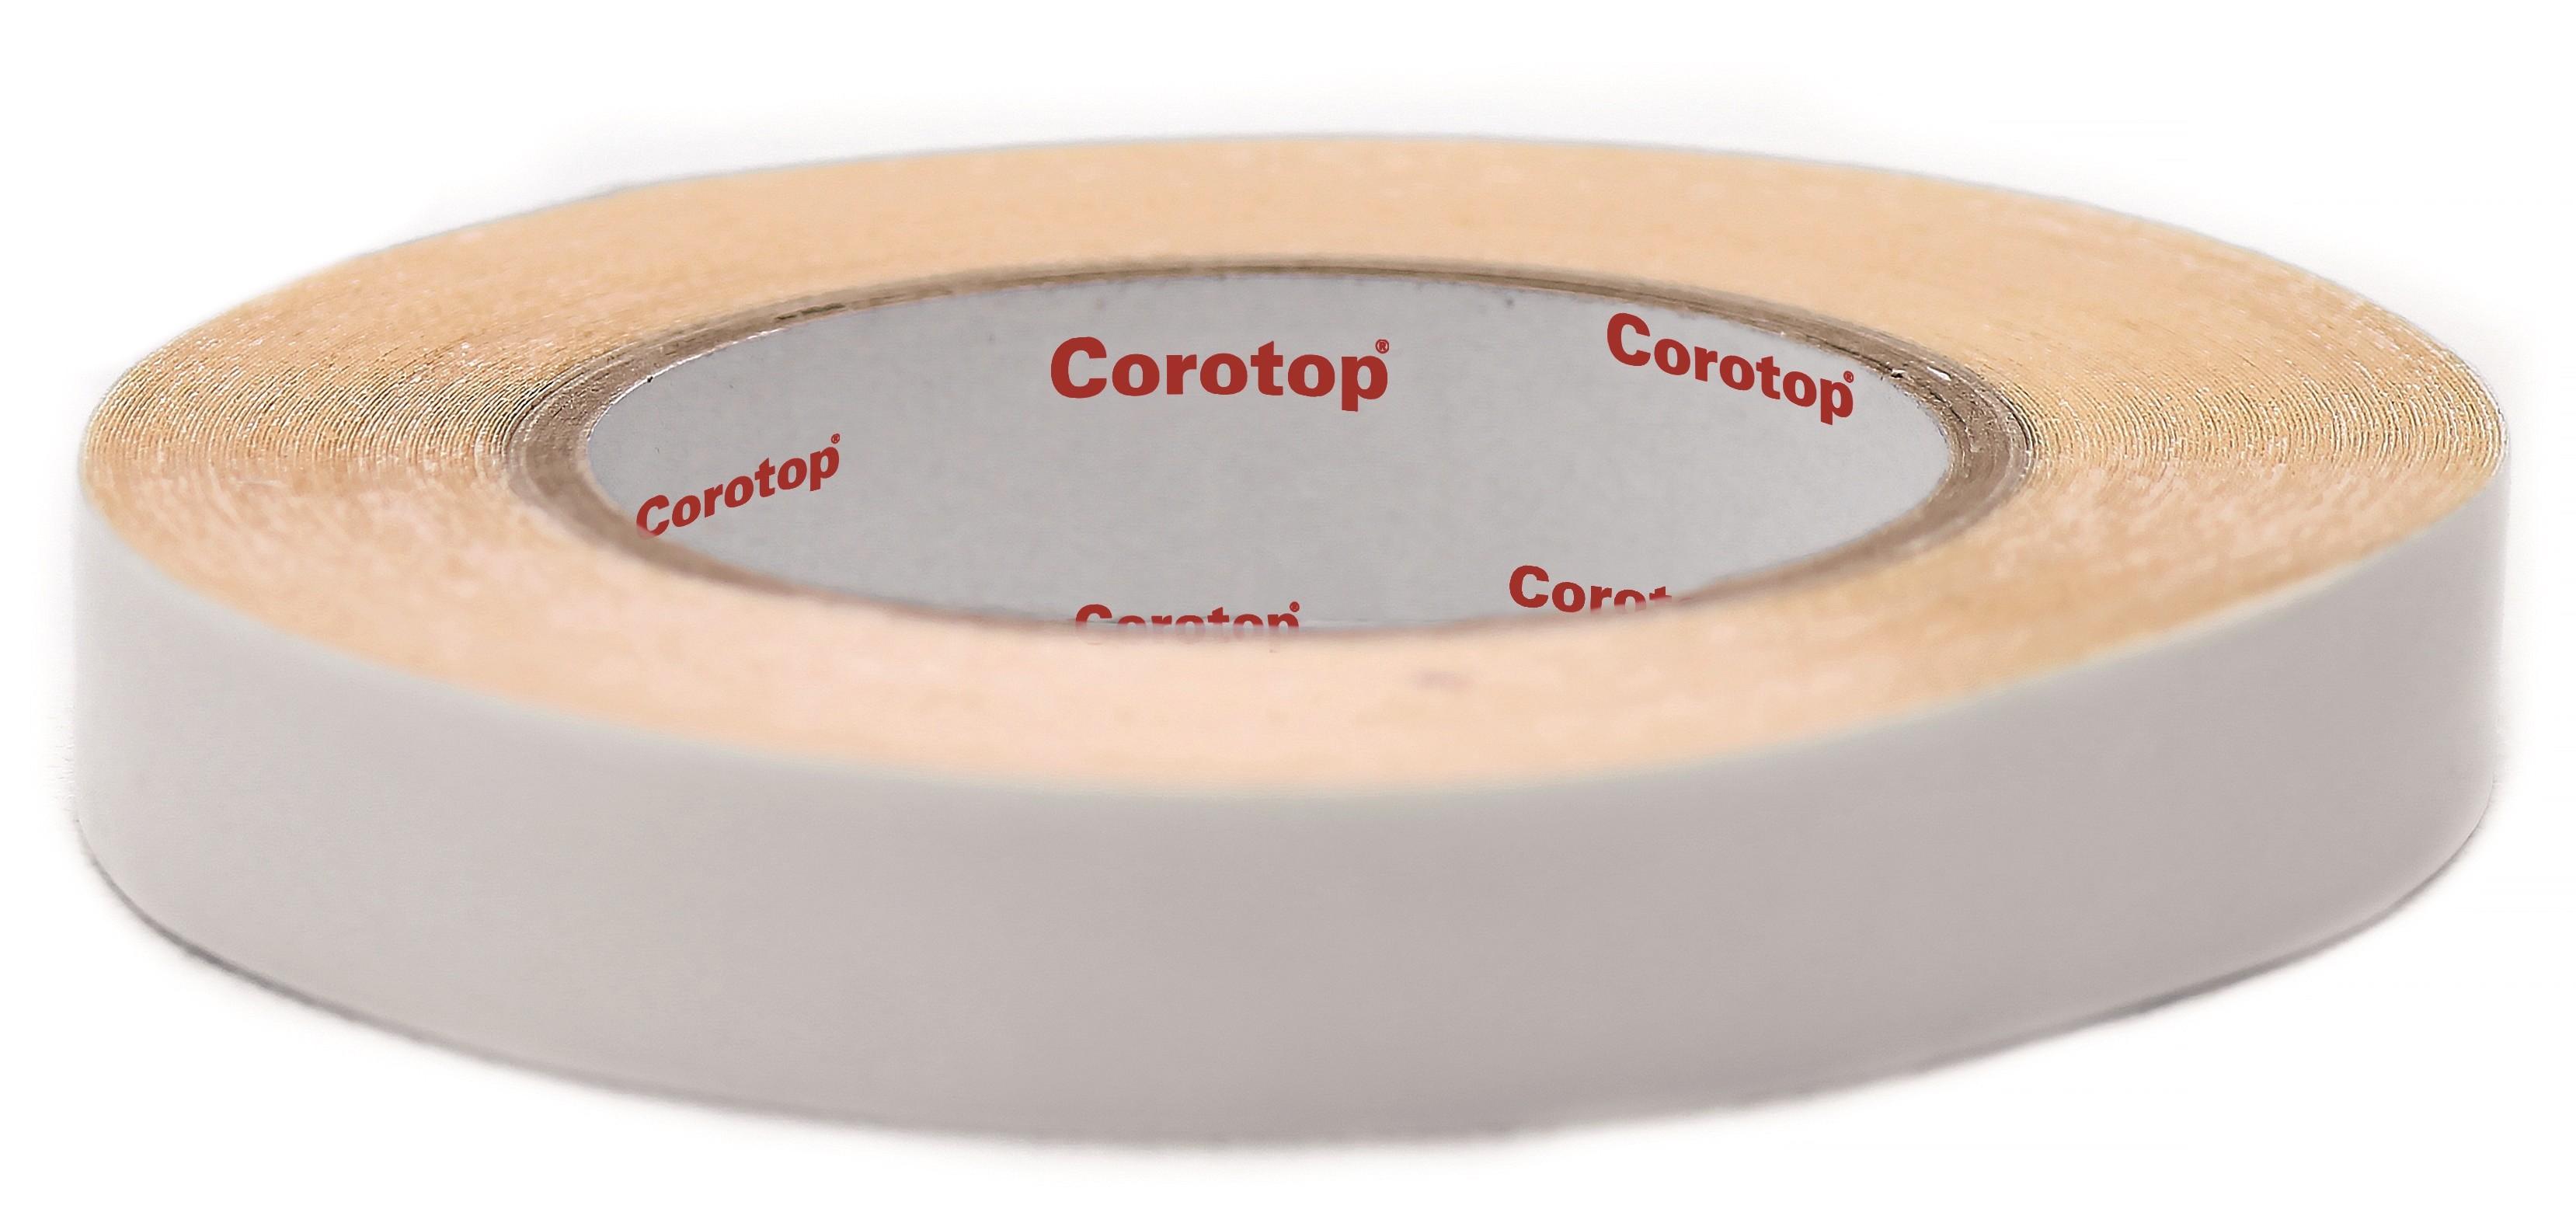 coromix doppelseitiges klebeband f r dampfsperre unterspannbahn kiosk rednet. Black Bedroom Furniture Sets. Home Design Ideas